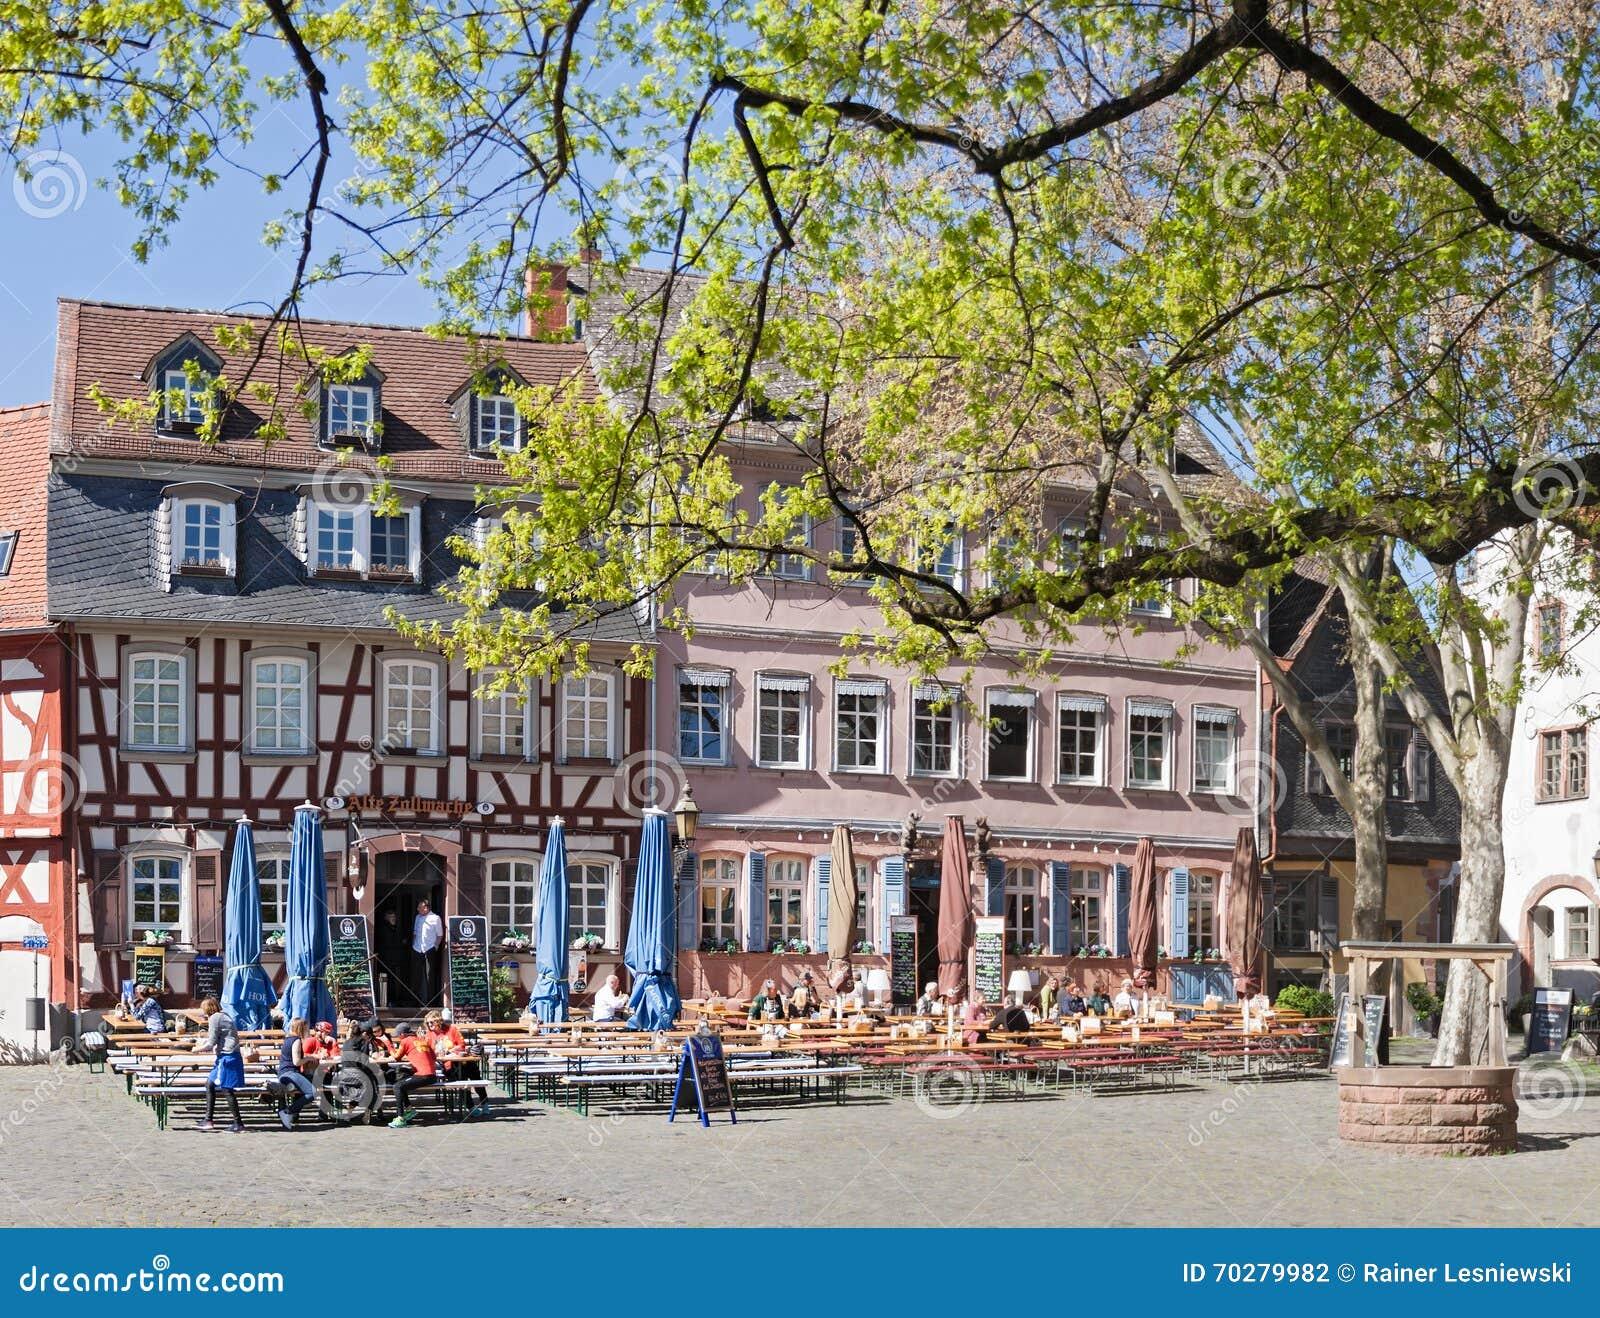 historisch paleisvierkant in frankfurt hoechst redactionele fotografie afbeelding bestaande. Black Bedroom Furniture Sets. Home Design Ideas